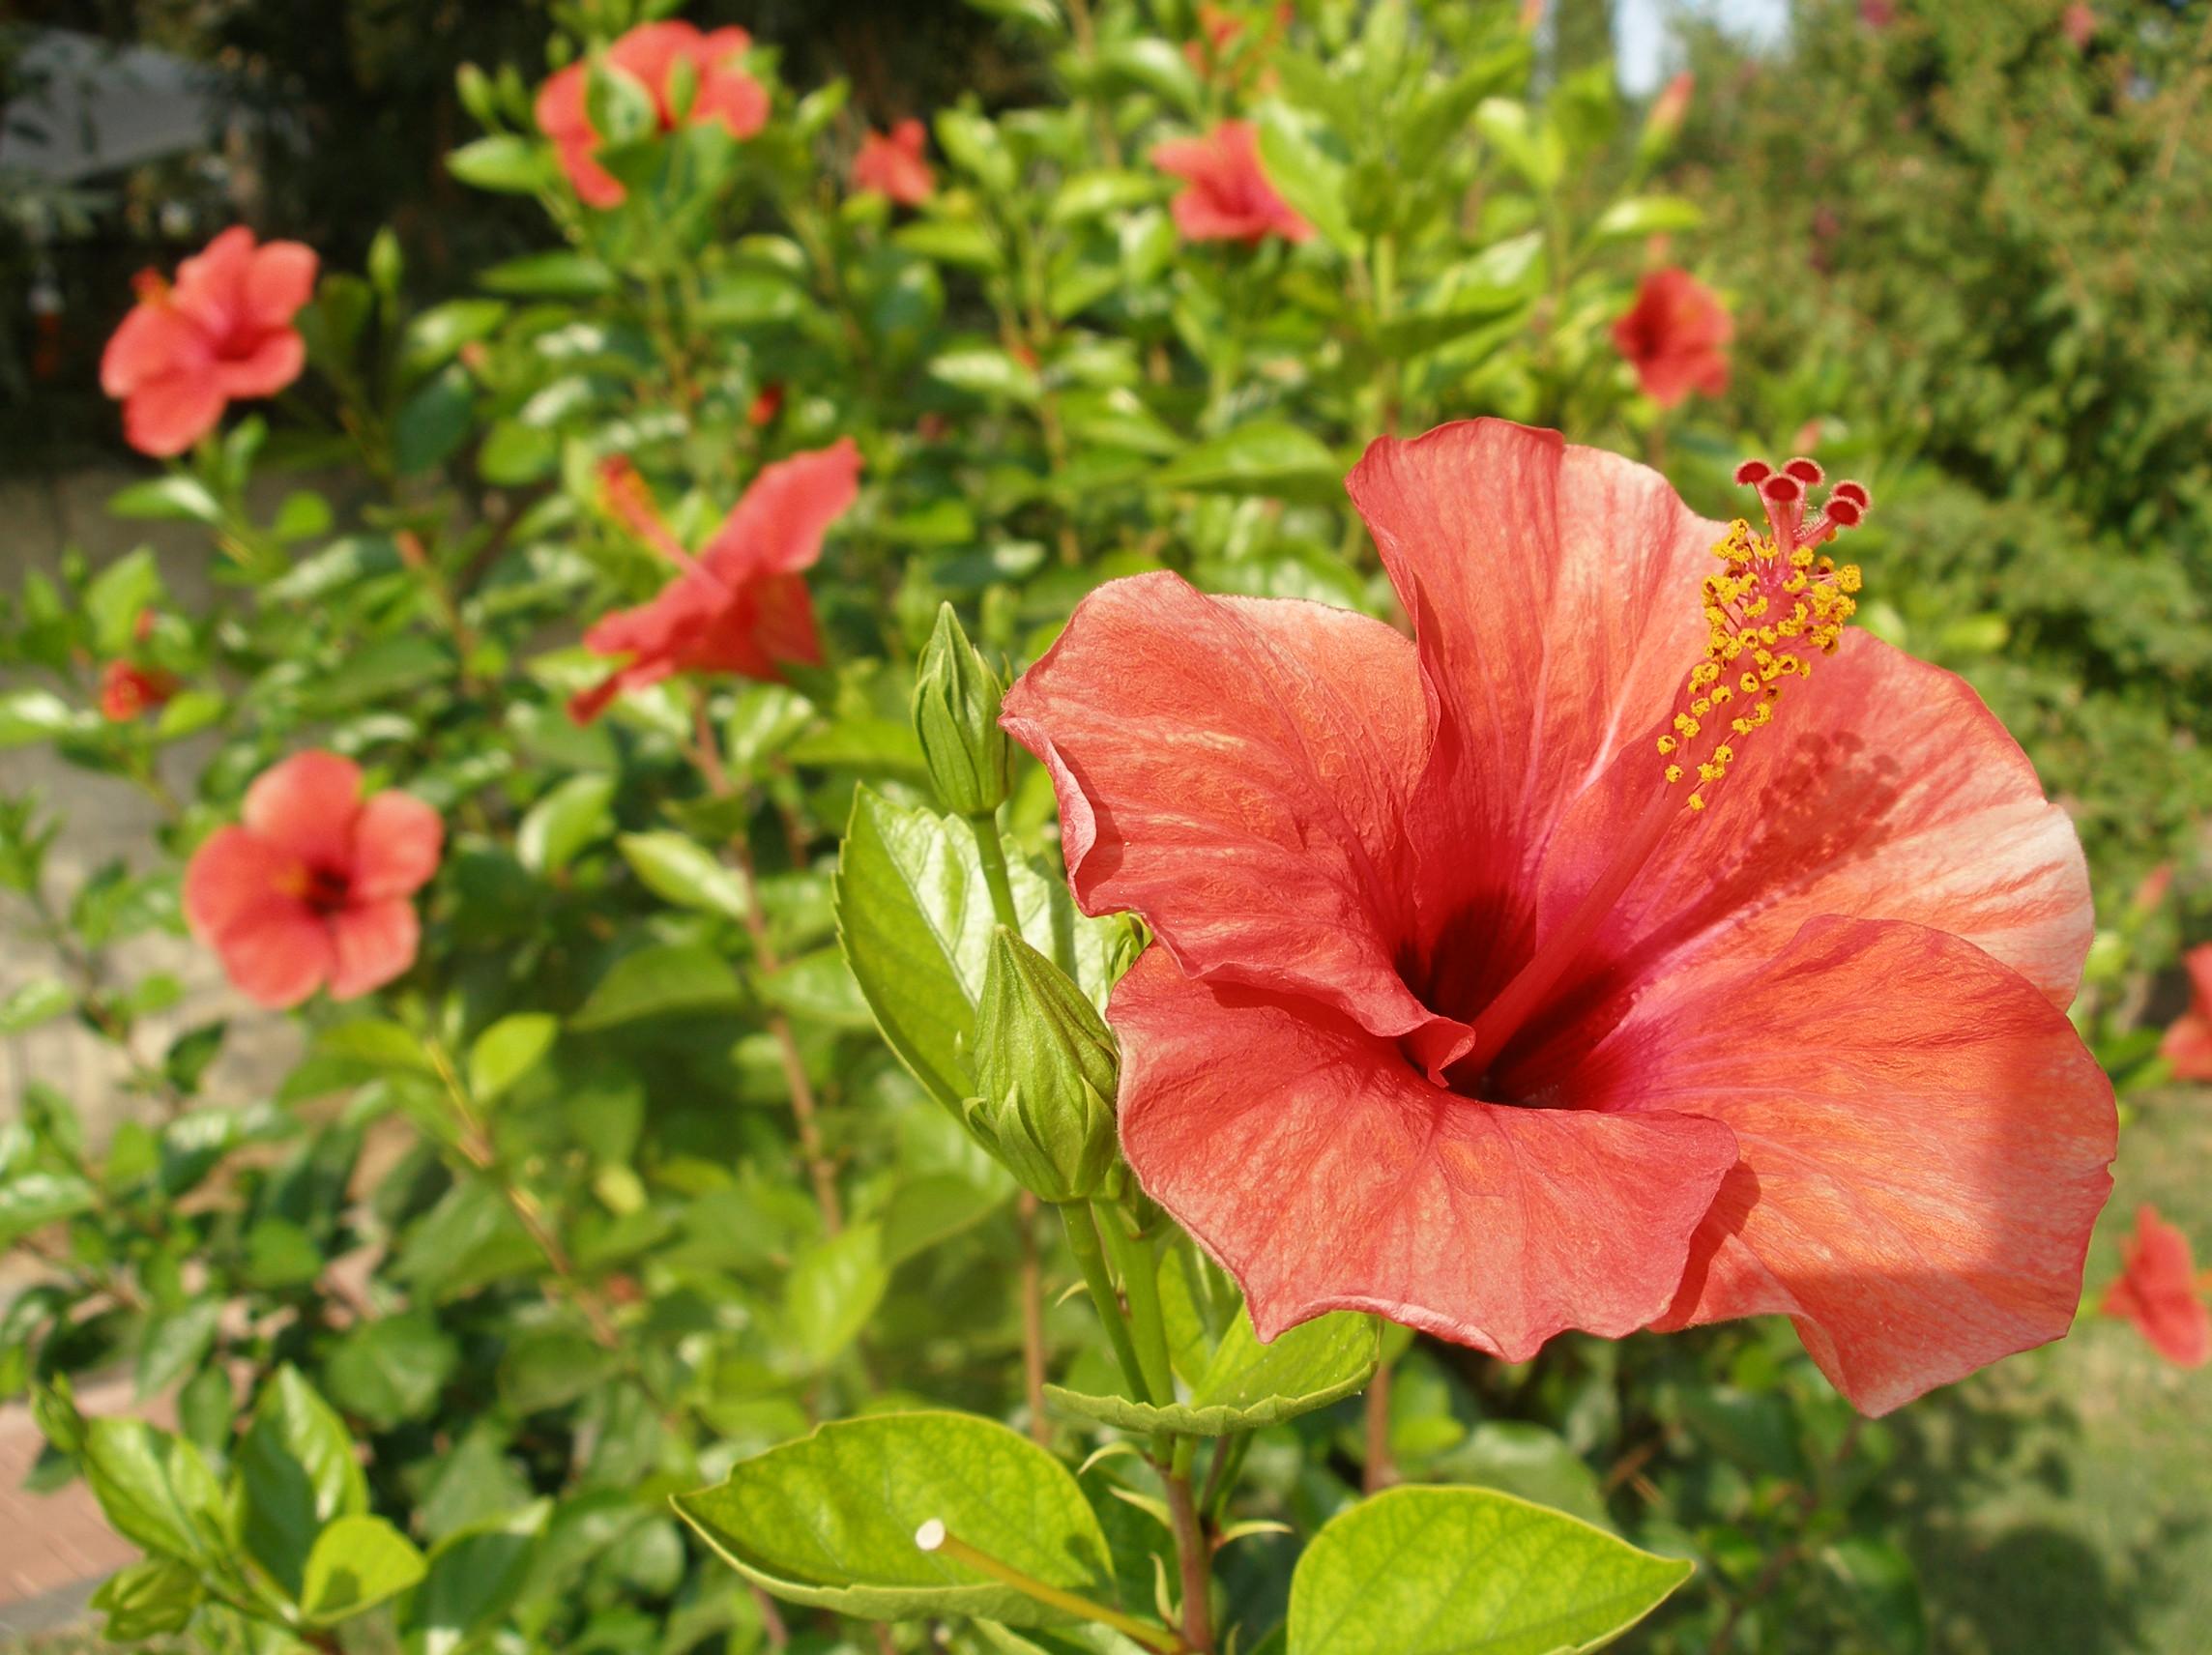 Plik hibiskus flowers jpg wikipedia wolna encyklopedia for Hibiskus pflege